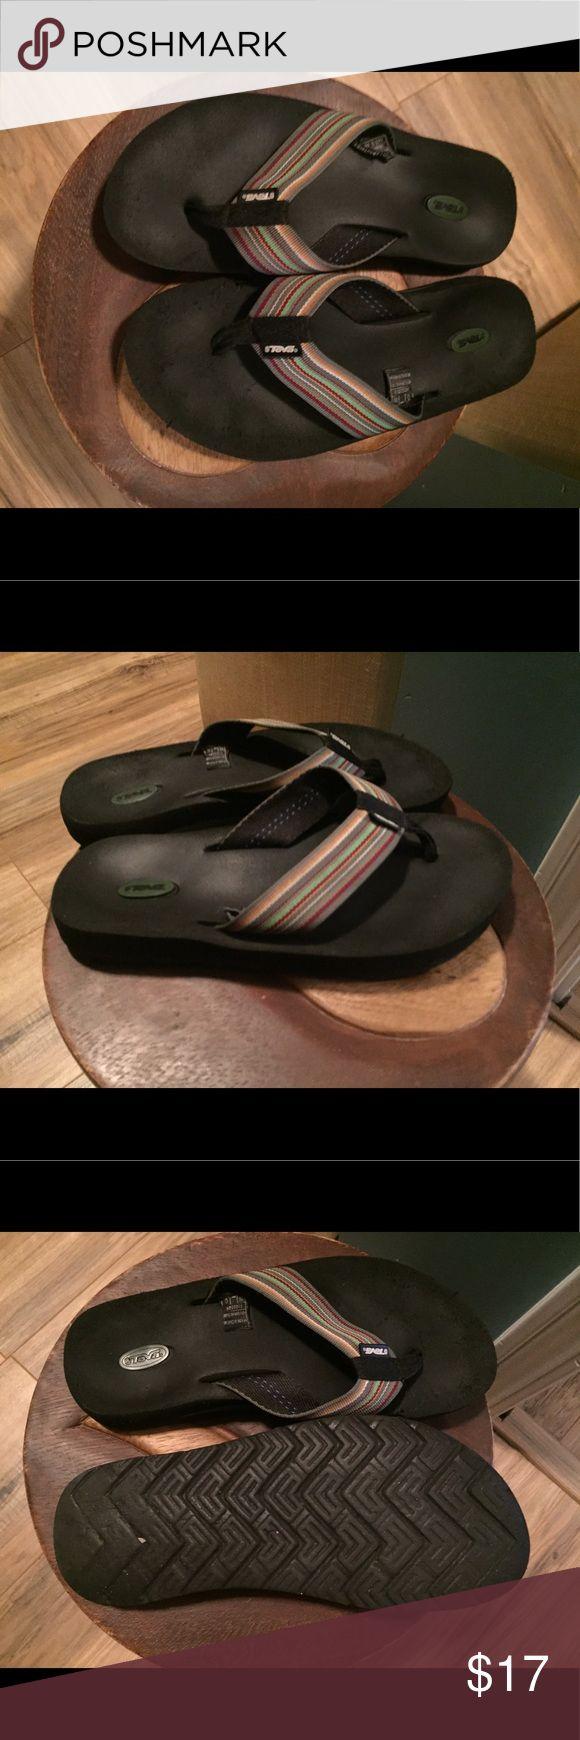 Teva Flip Flops Teva Flip Flops. Used but still has a lot of life left Teva Shoes Sandals